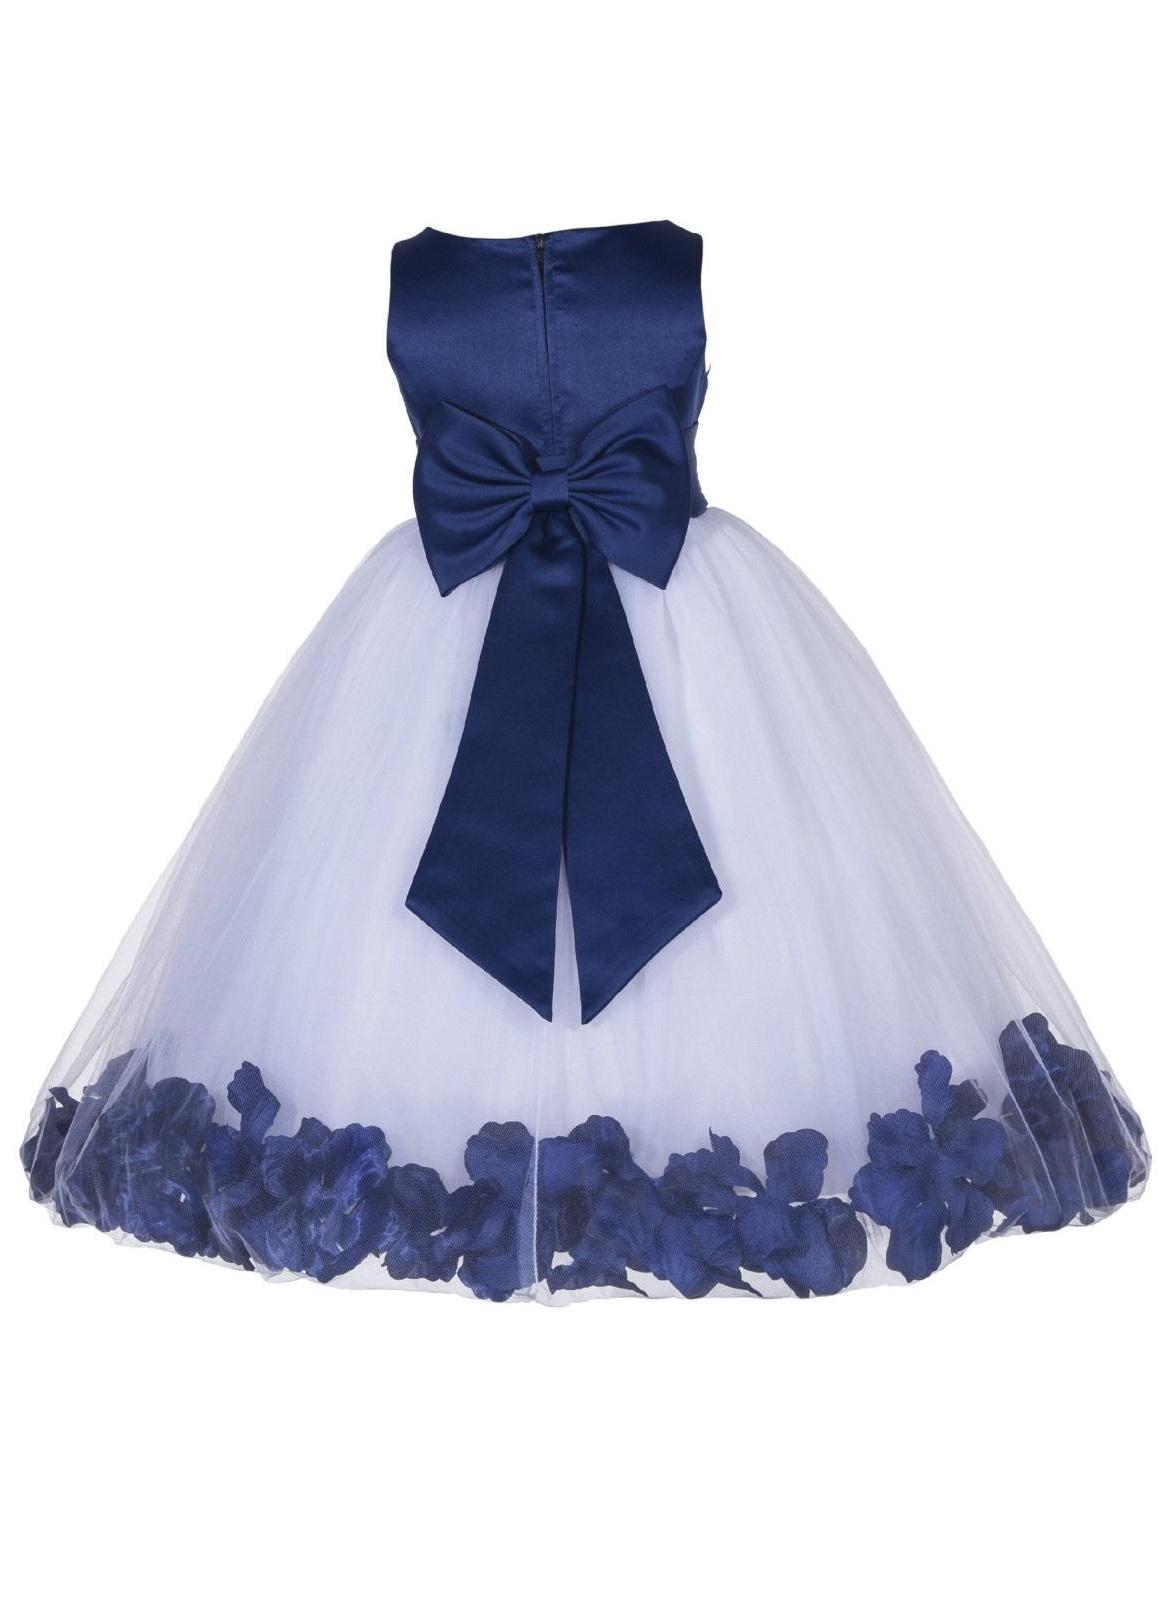 Ekidsbridal Rose Petals Tulle Flower Girl Dress Wedding Pageant Toddler Easter Recital 167T apple size 6